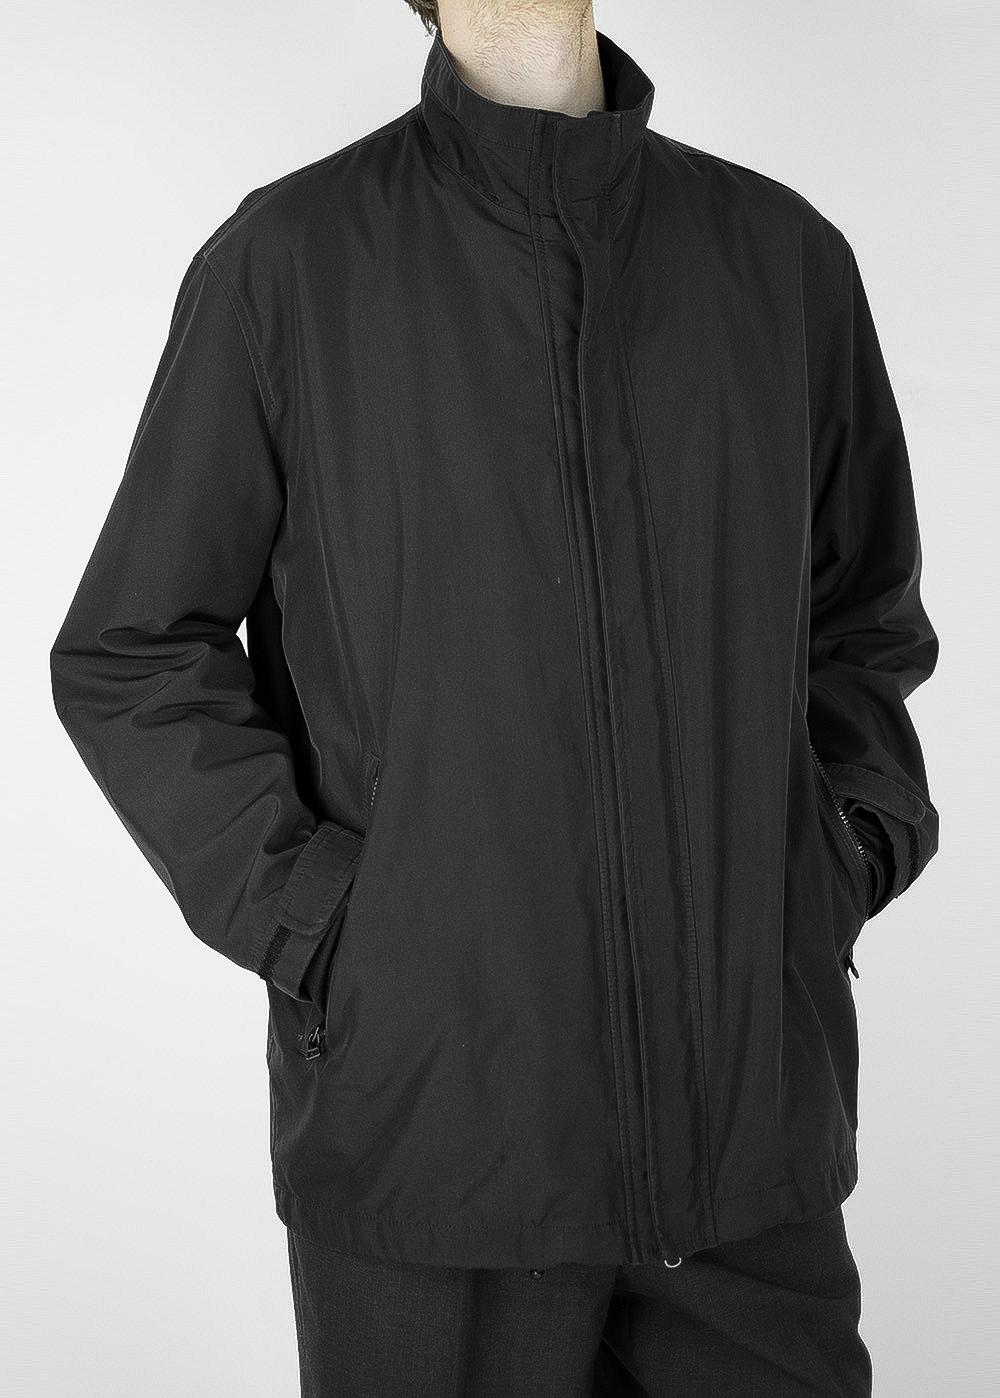 Black Jacket 6